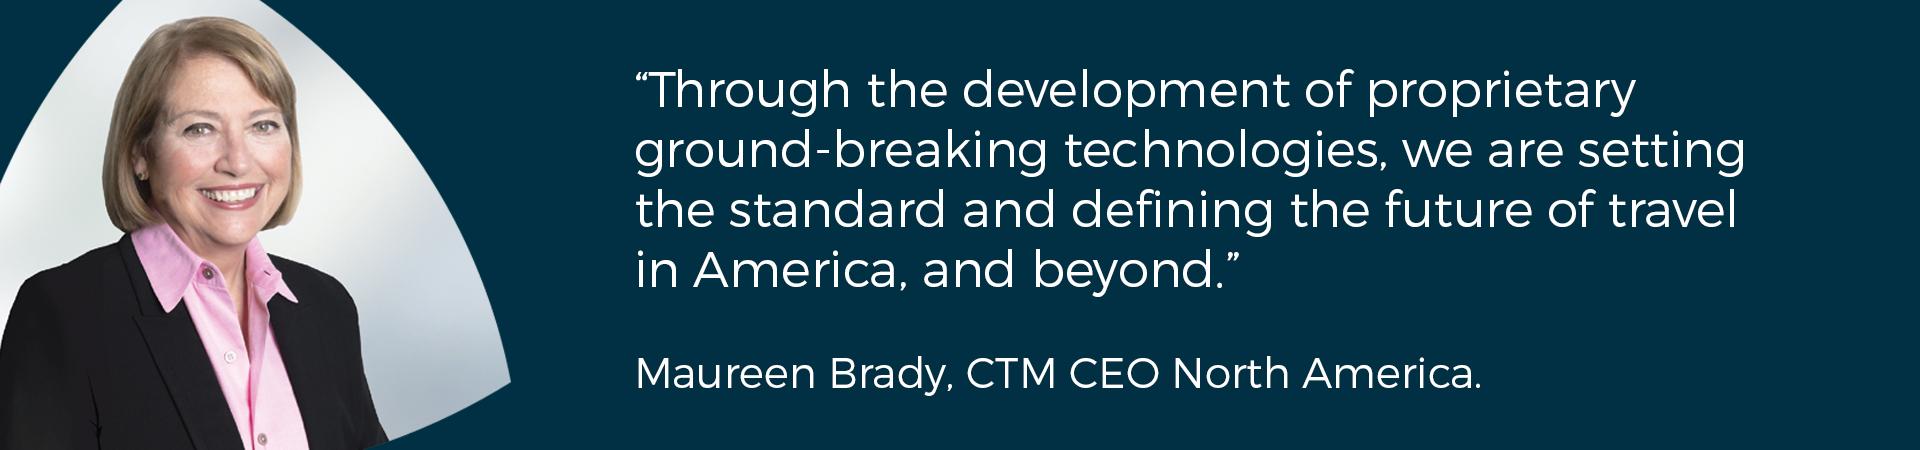 Maureen Brady CEO North America